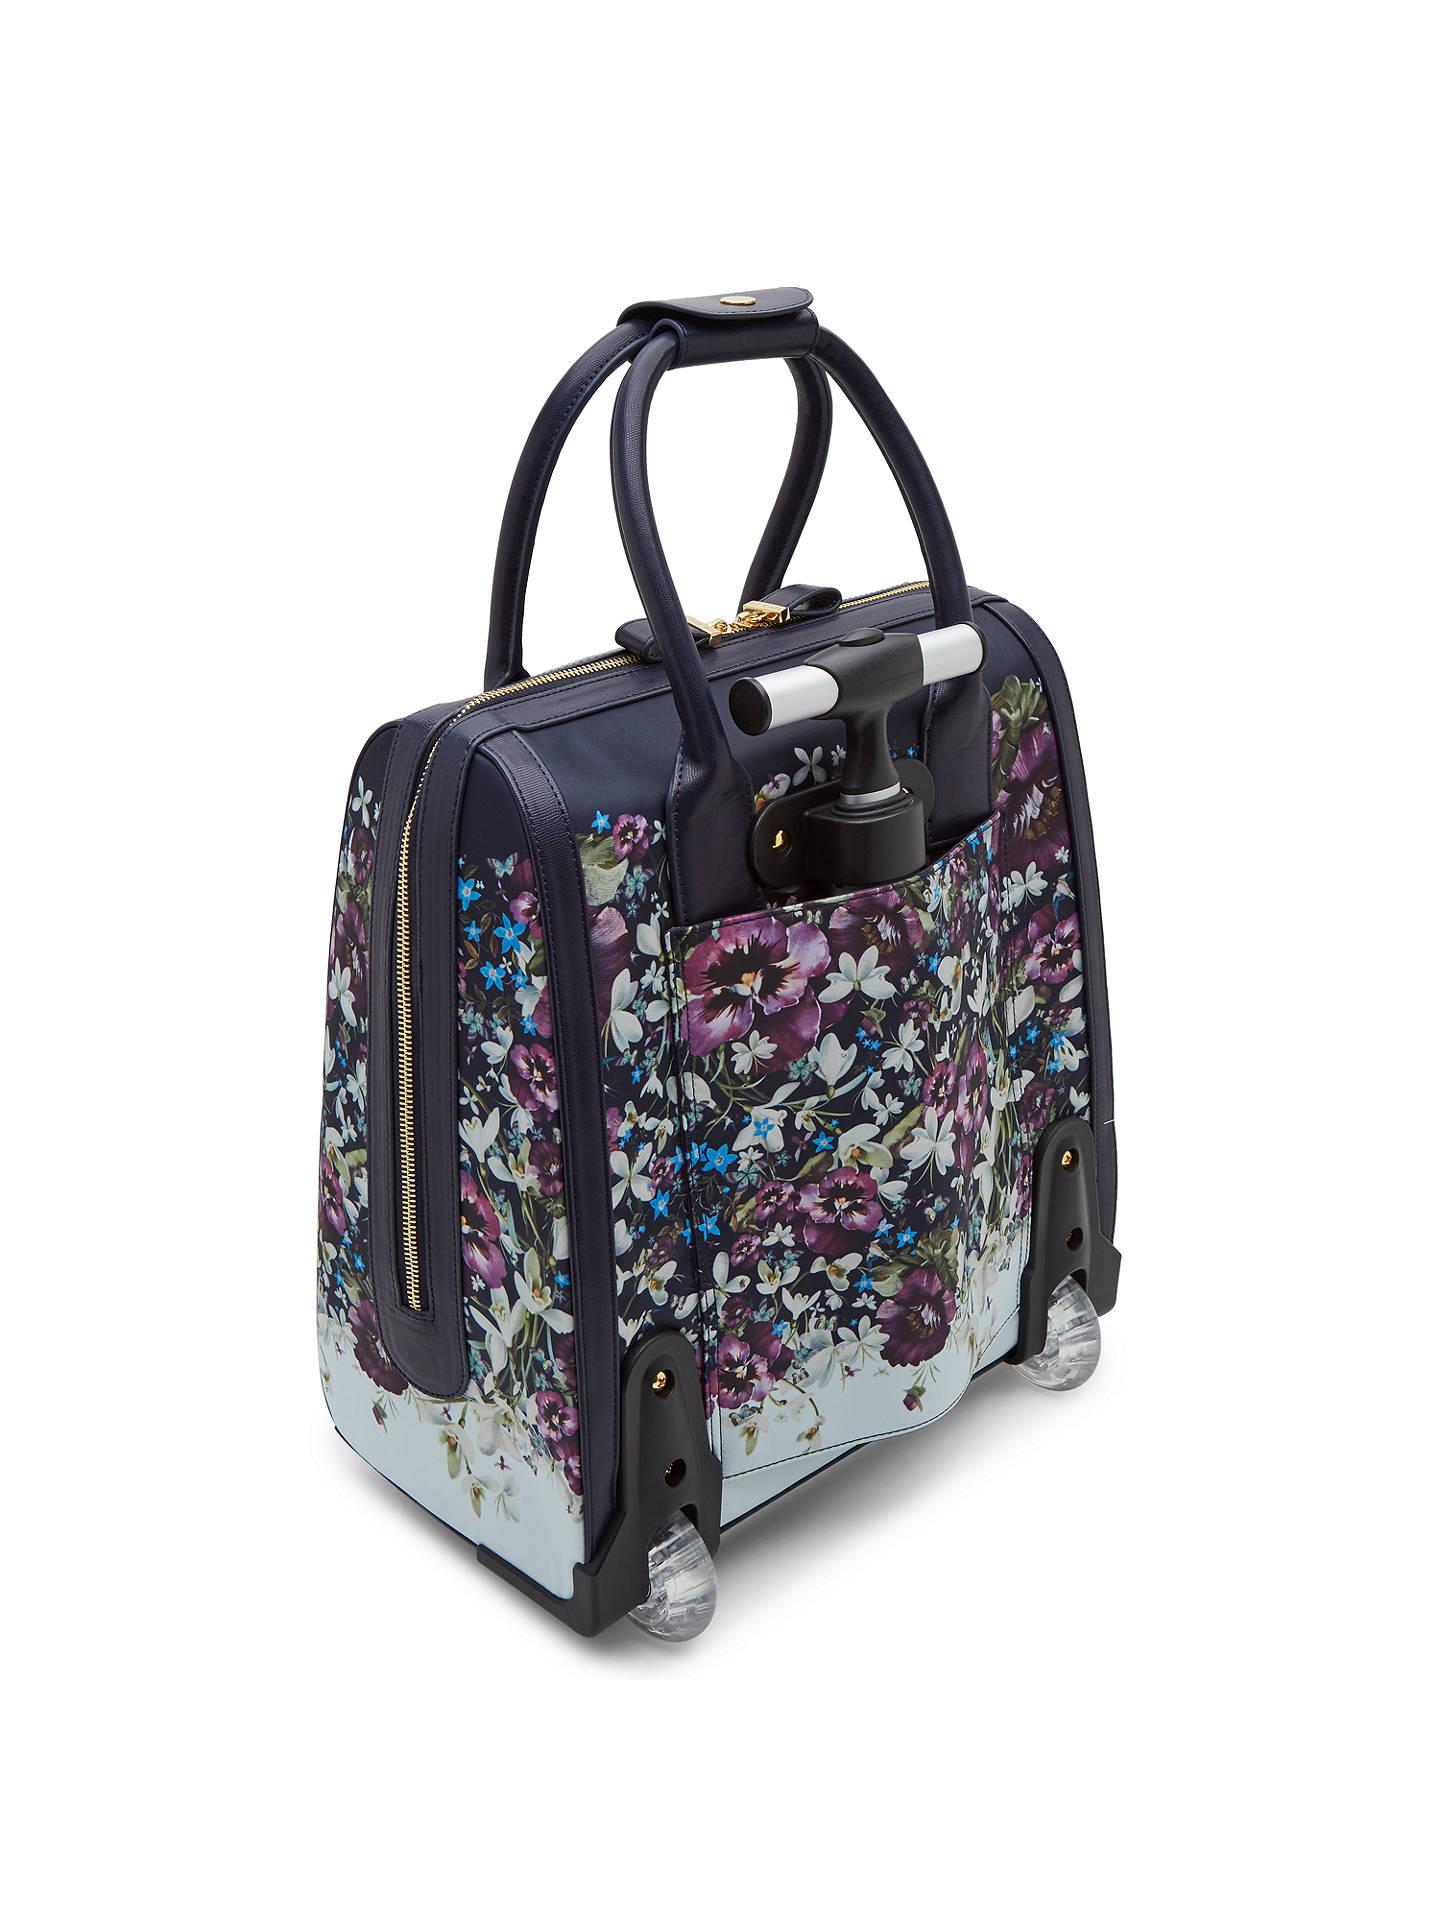 0a5e75f66dc2 ... BuyTed Baker Jaki Entangled Enchantment Travel Bag